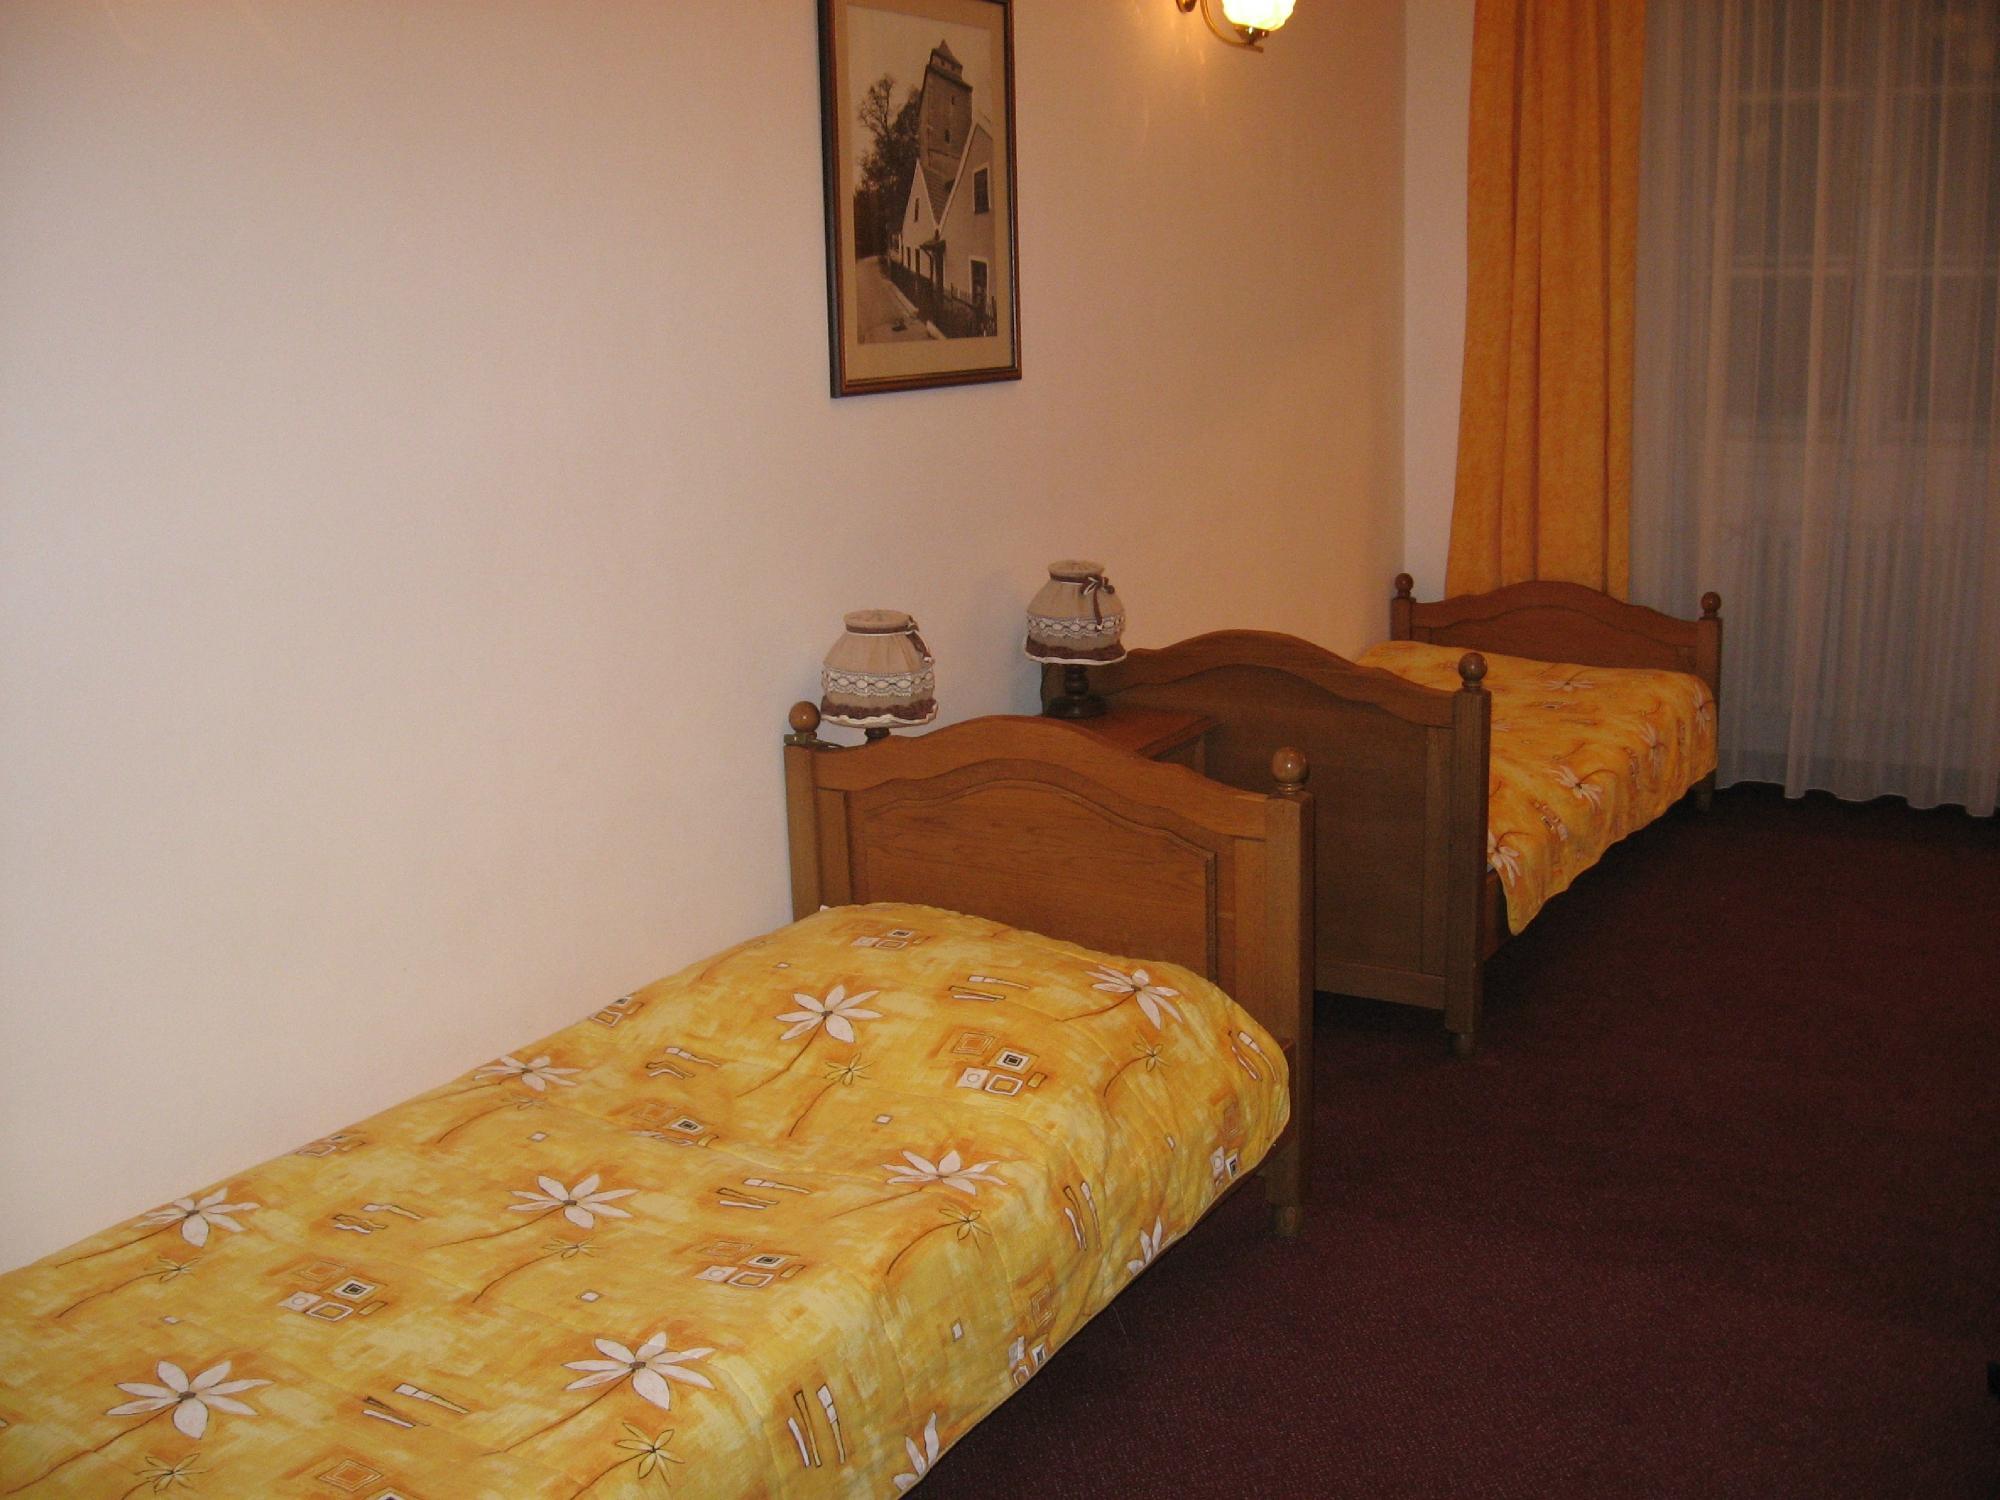 Hotel Maly Pivovar